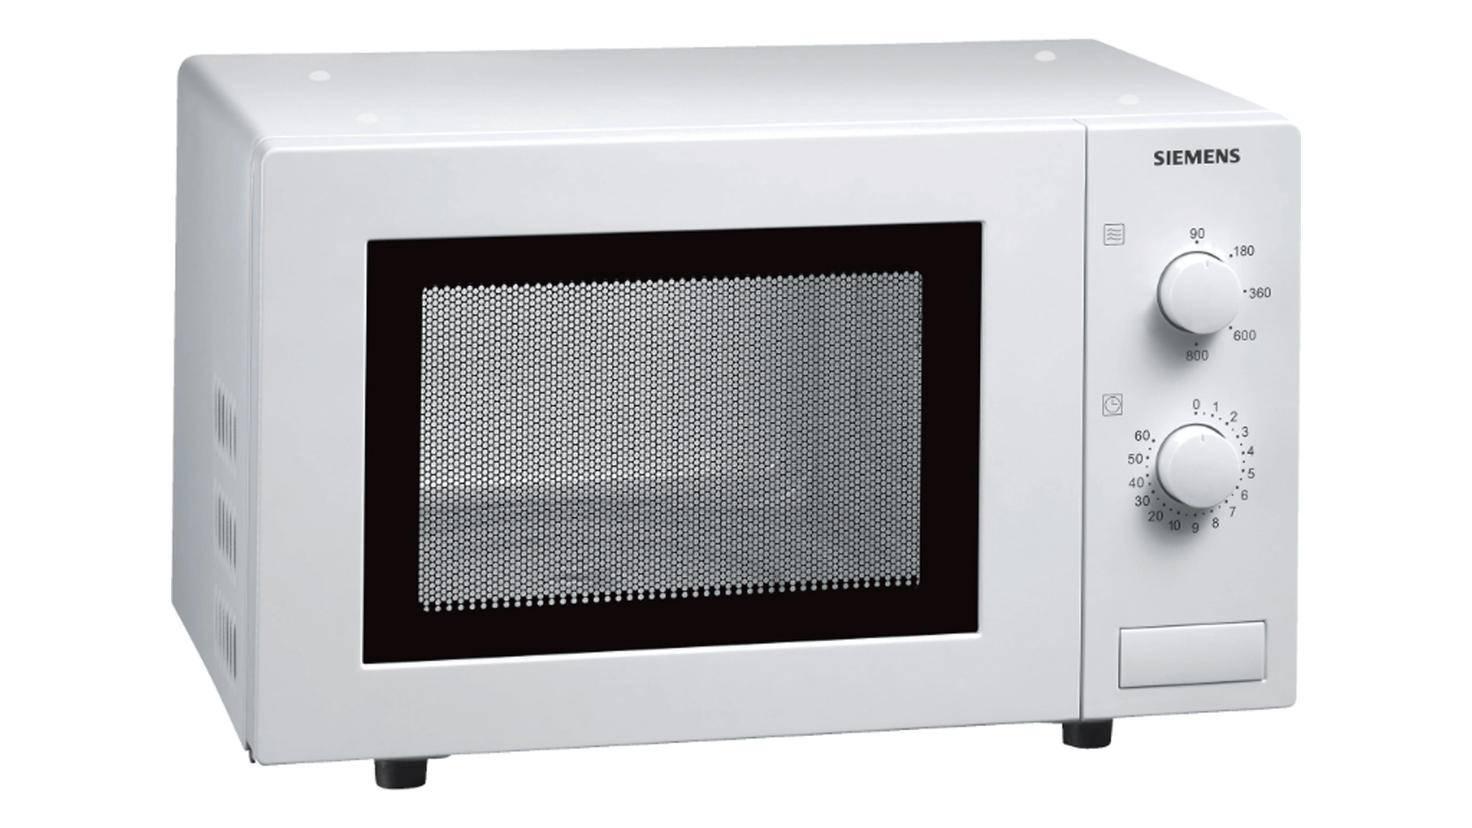 Mikrowelle HF12M240 Siemens SATURN